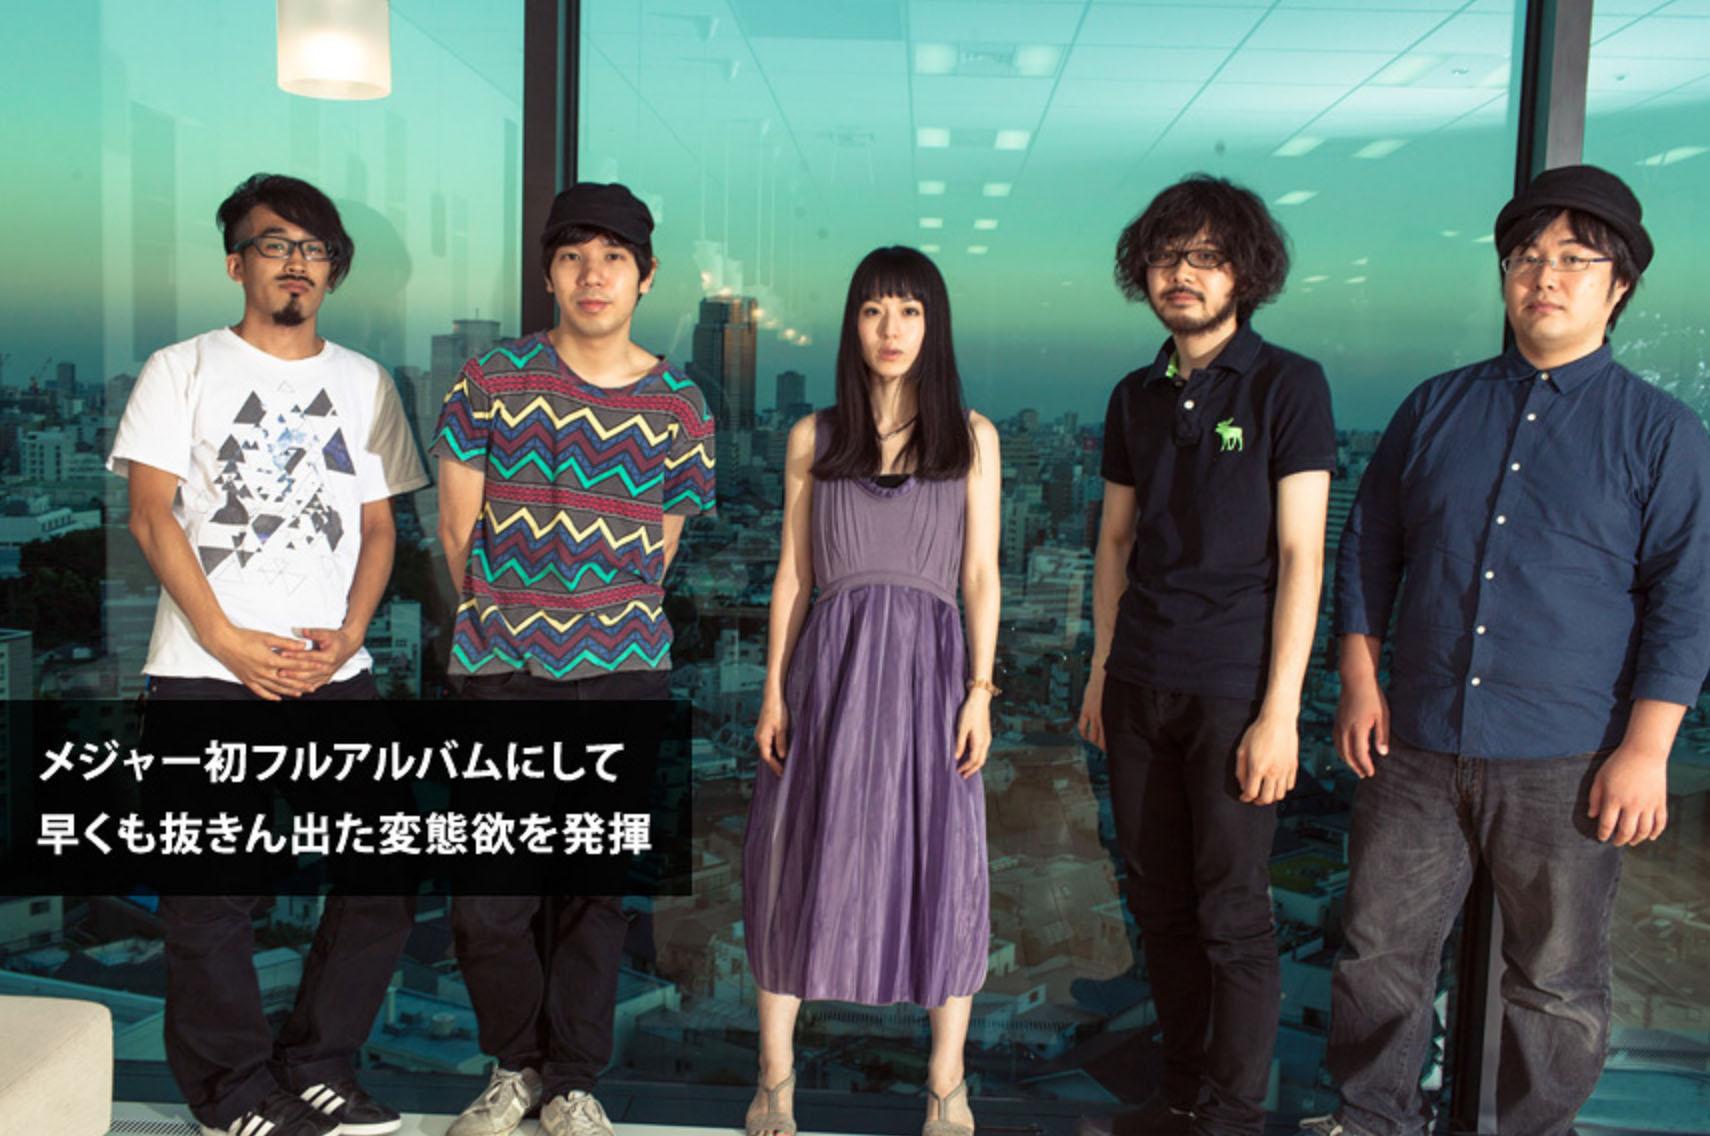 TAMTAMメジャー初フルアルバムインタビュー掲載